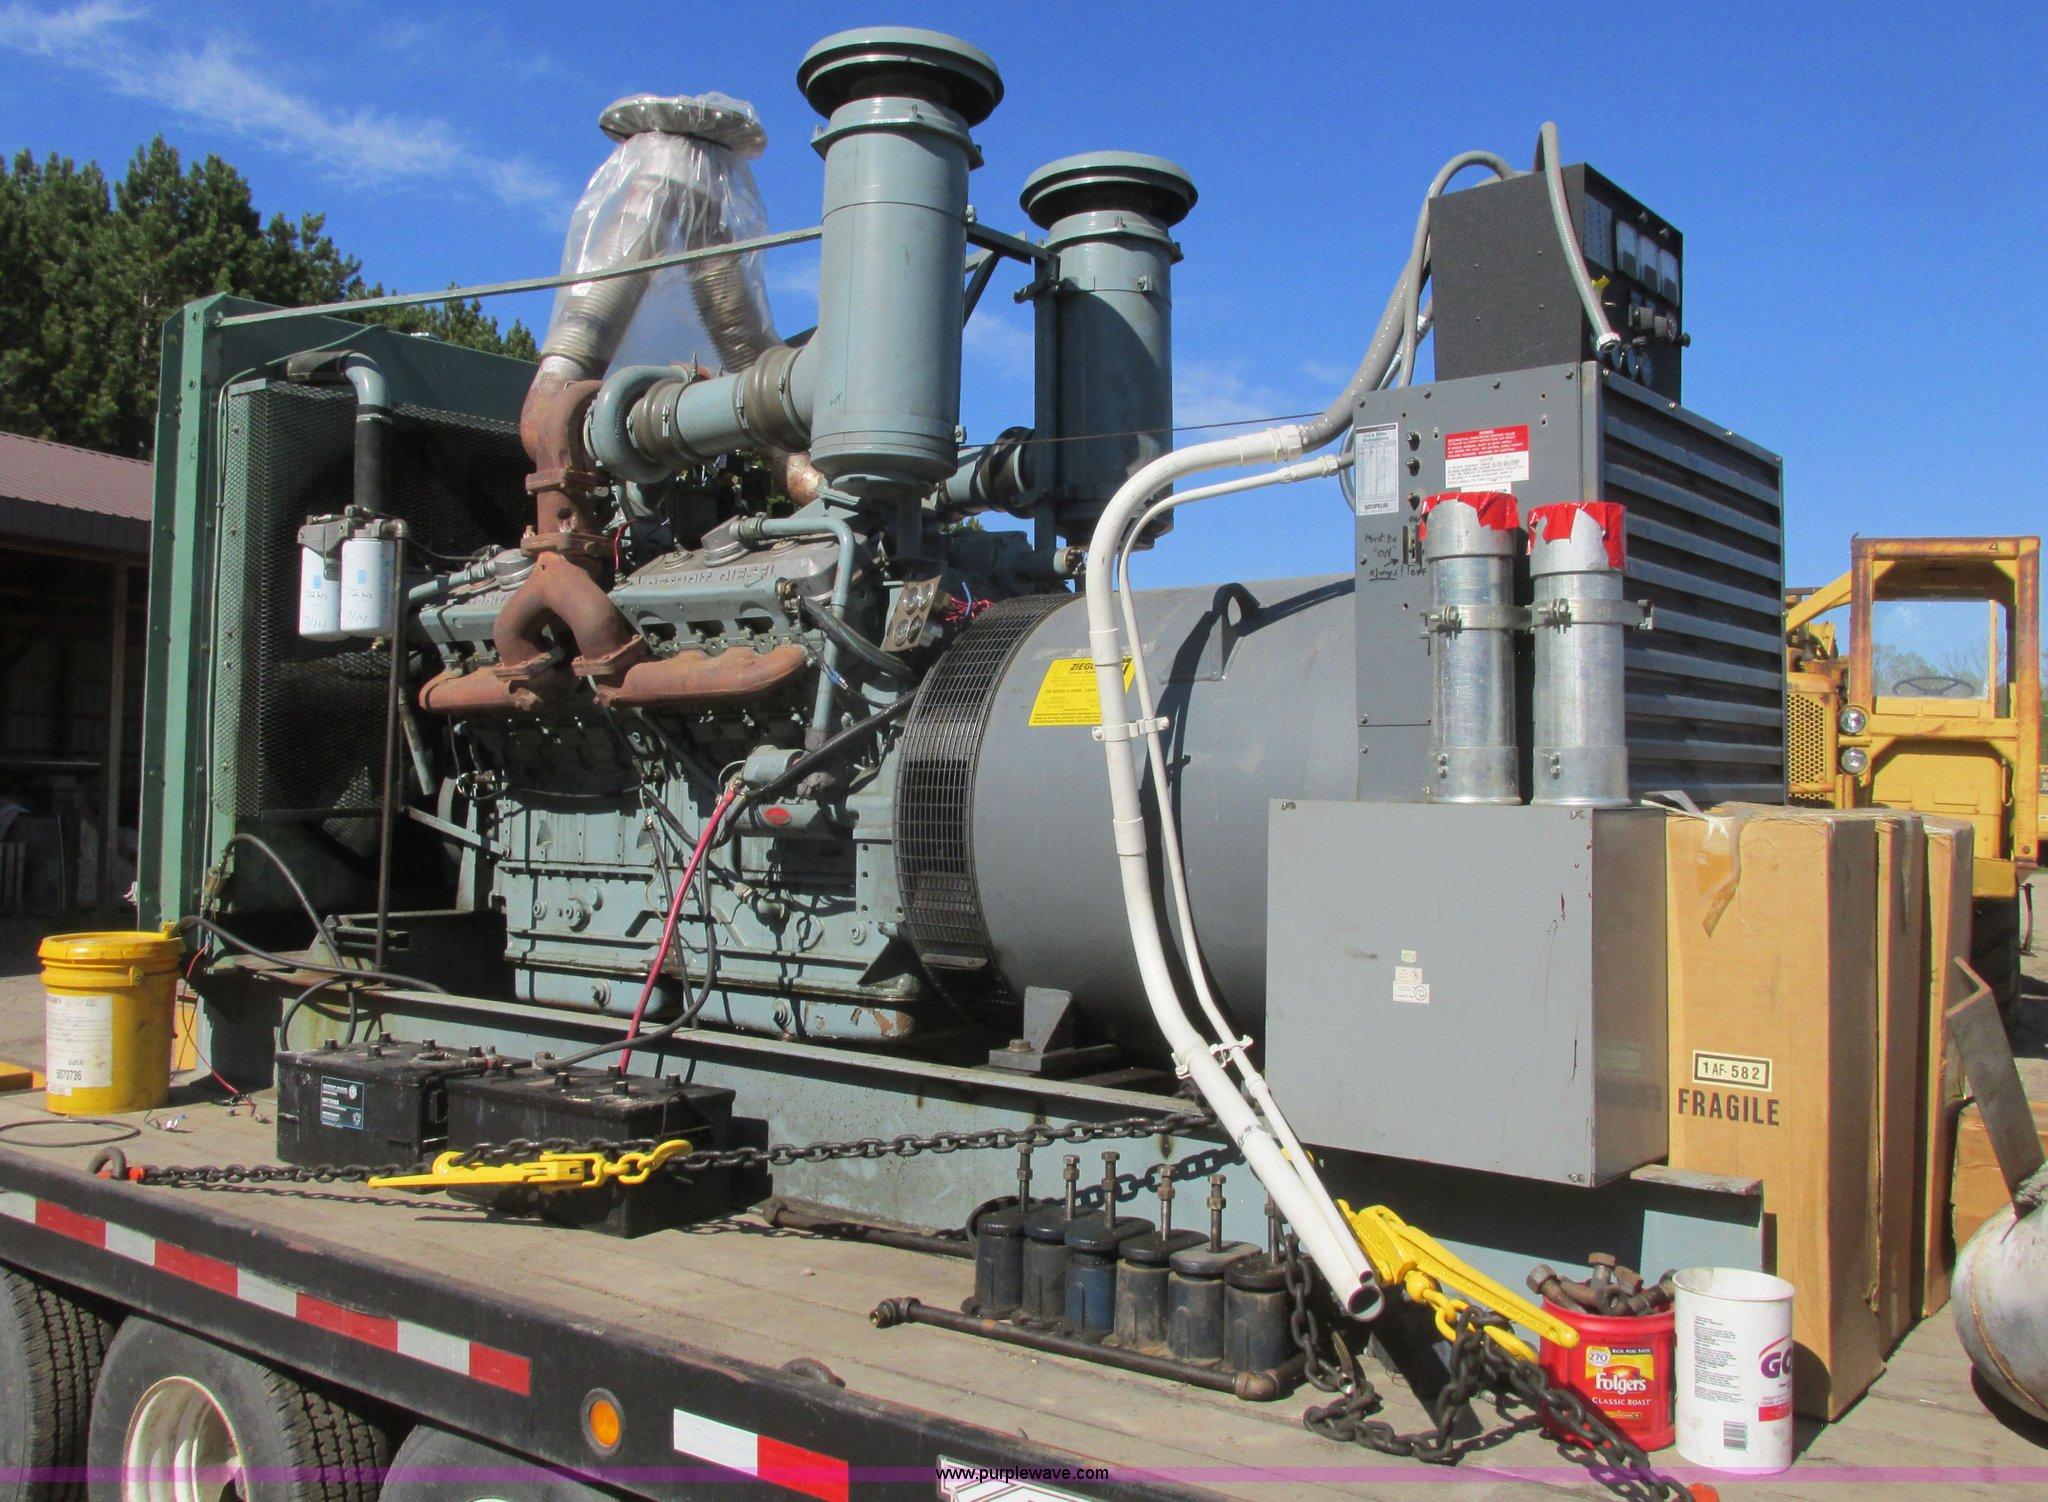 Detroit Diesel generator set | Item A8808 | SOLD! June 25 Co